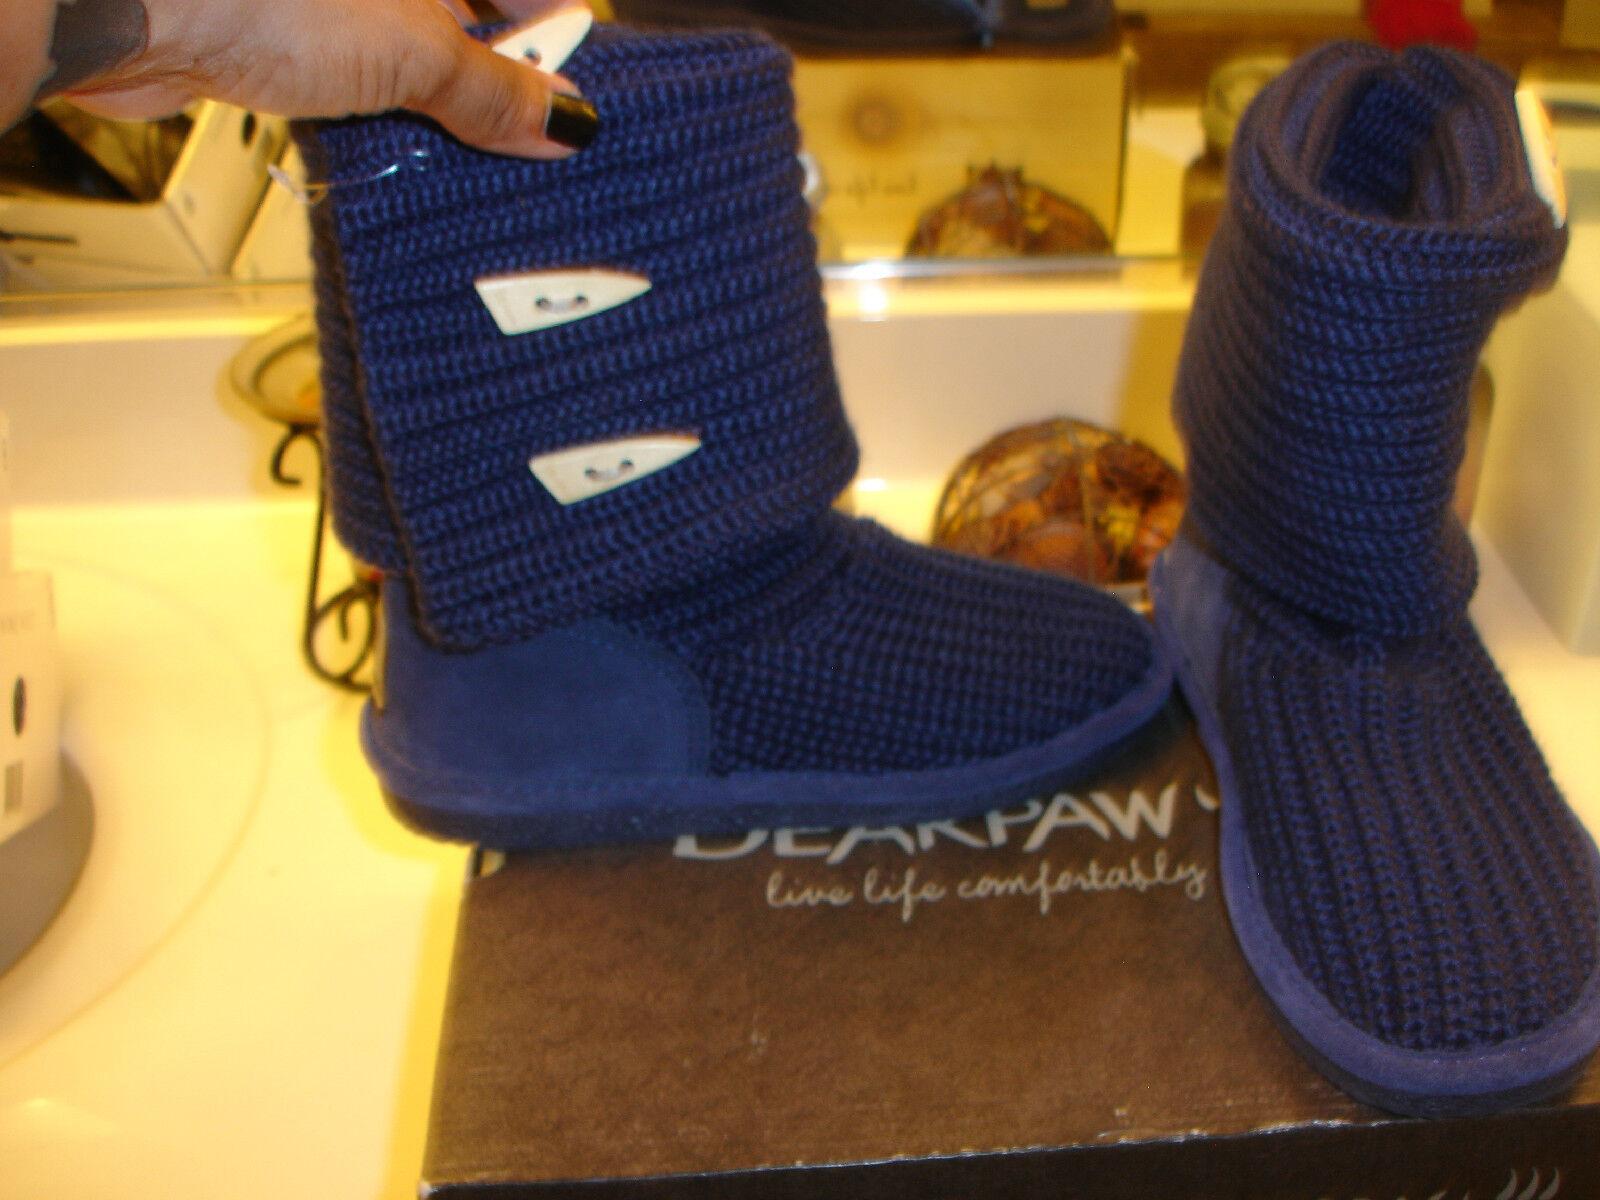 Bear Paw Knit Tall Short Sweater Blau Boot Nice Quality Comfortable 95 7